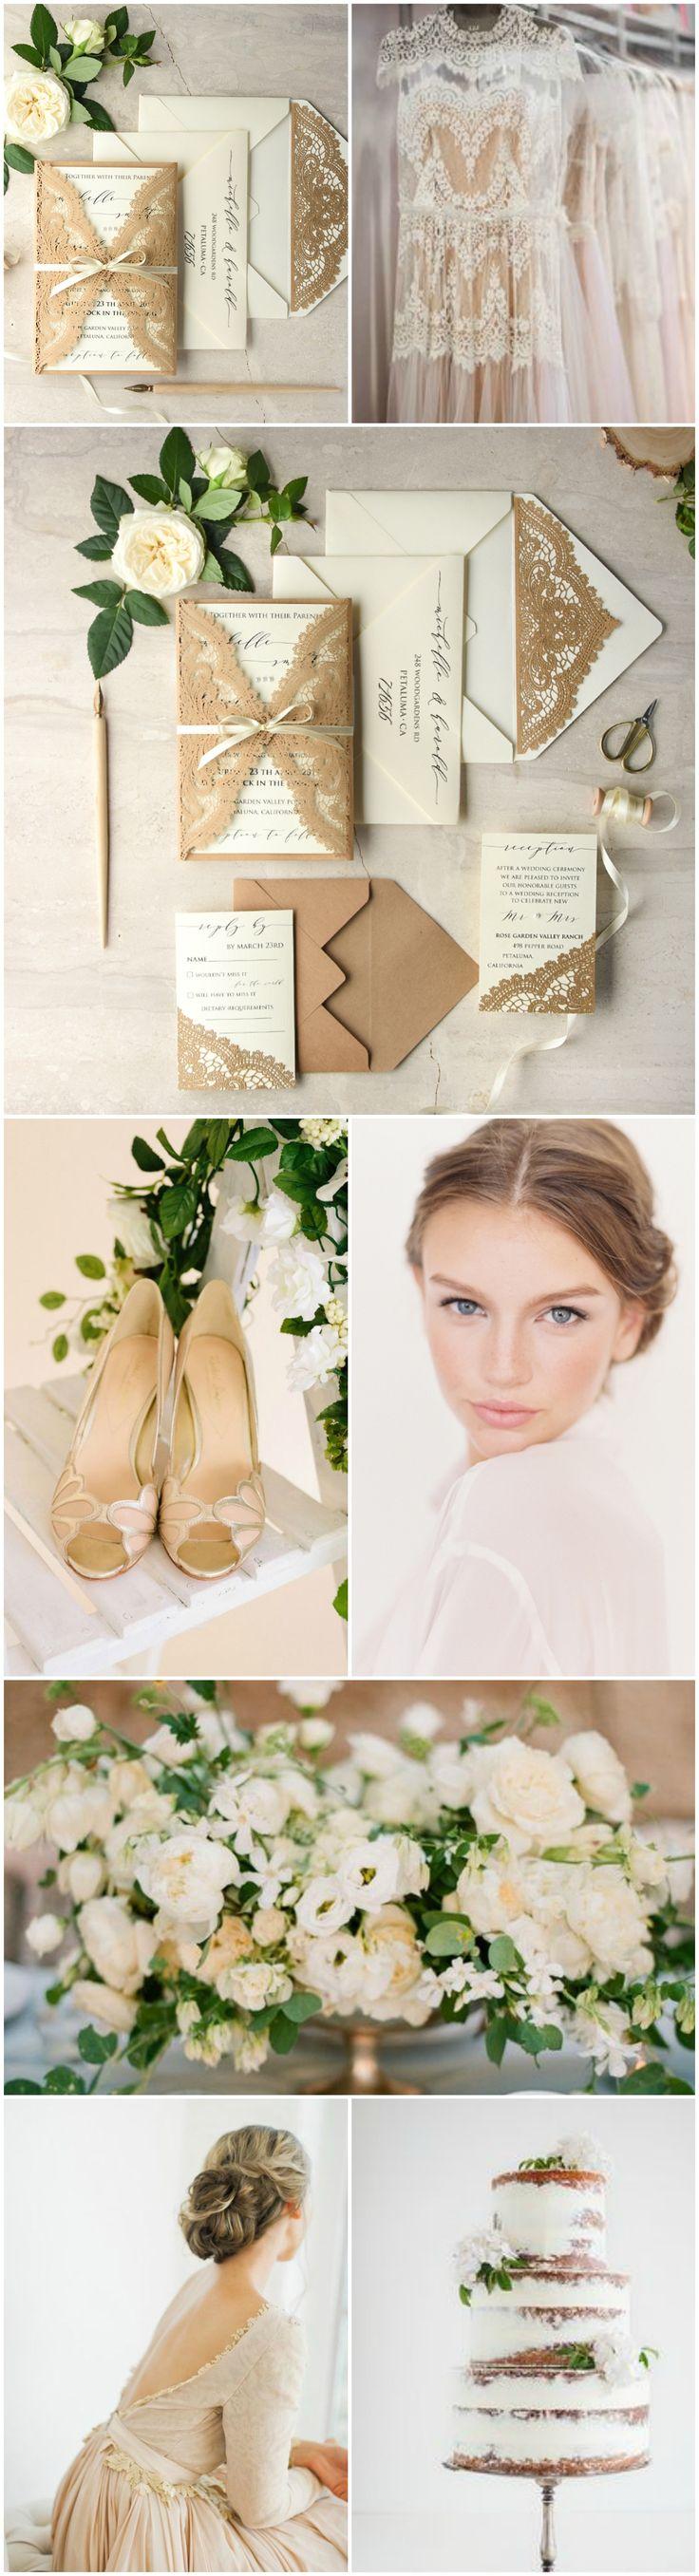 Nude & Neutrals Wedding theme #weddingtrend2017 #nude #neutrals #romantic #weddingideas #weddingcolors #rustic #boho #lasercut #weddinginvitations